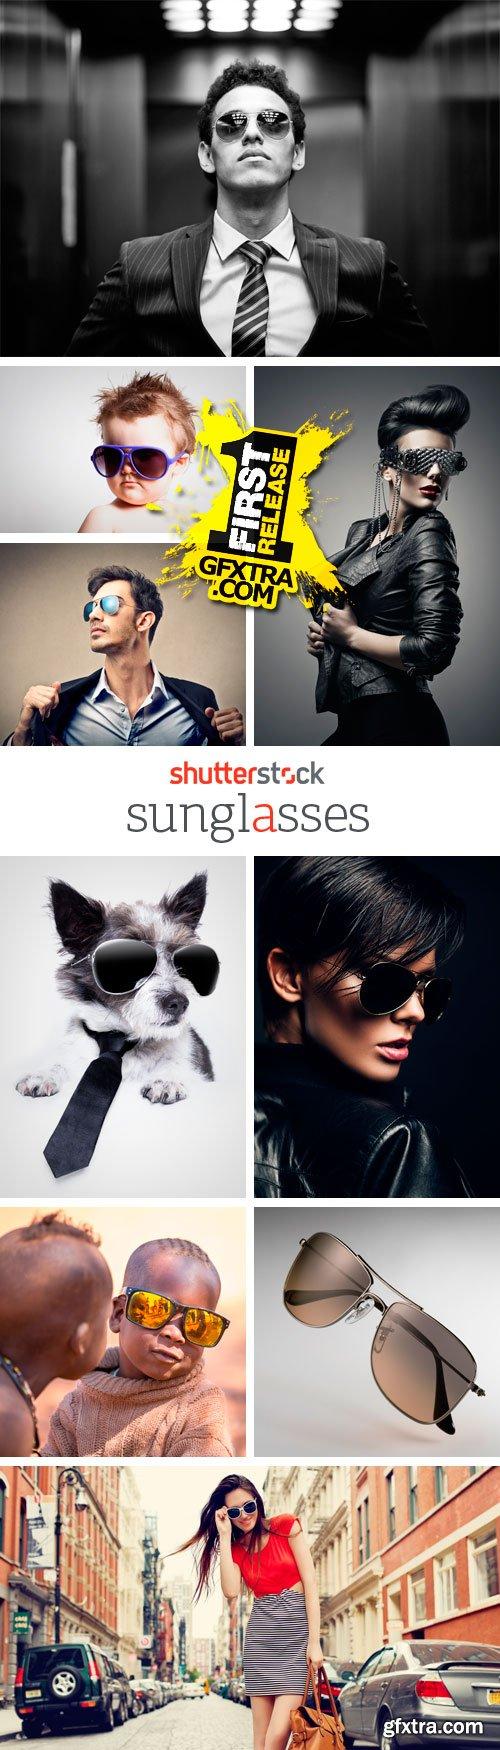 Amazing SS - Sunglasses, 25xJPGs